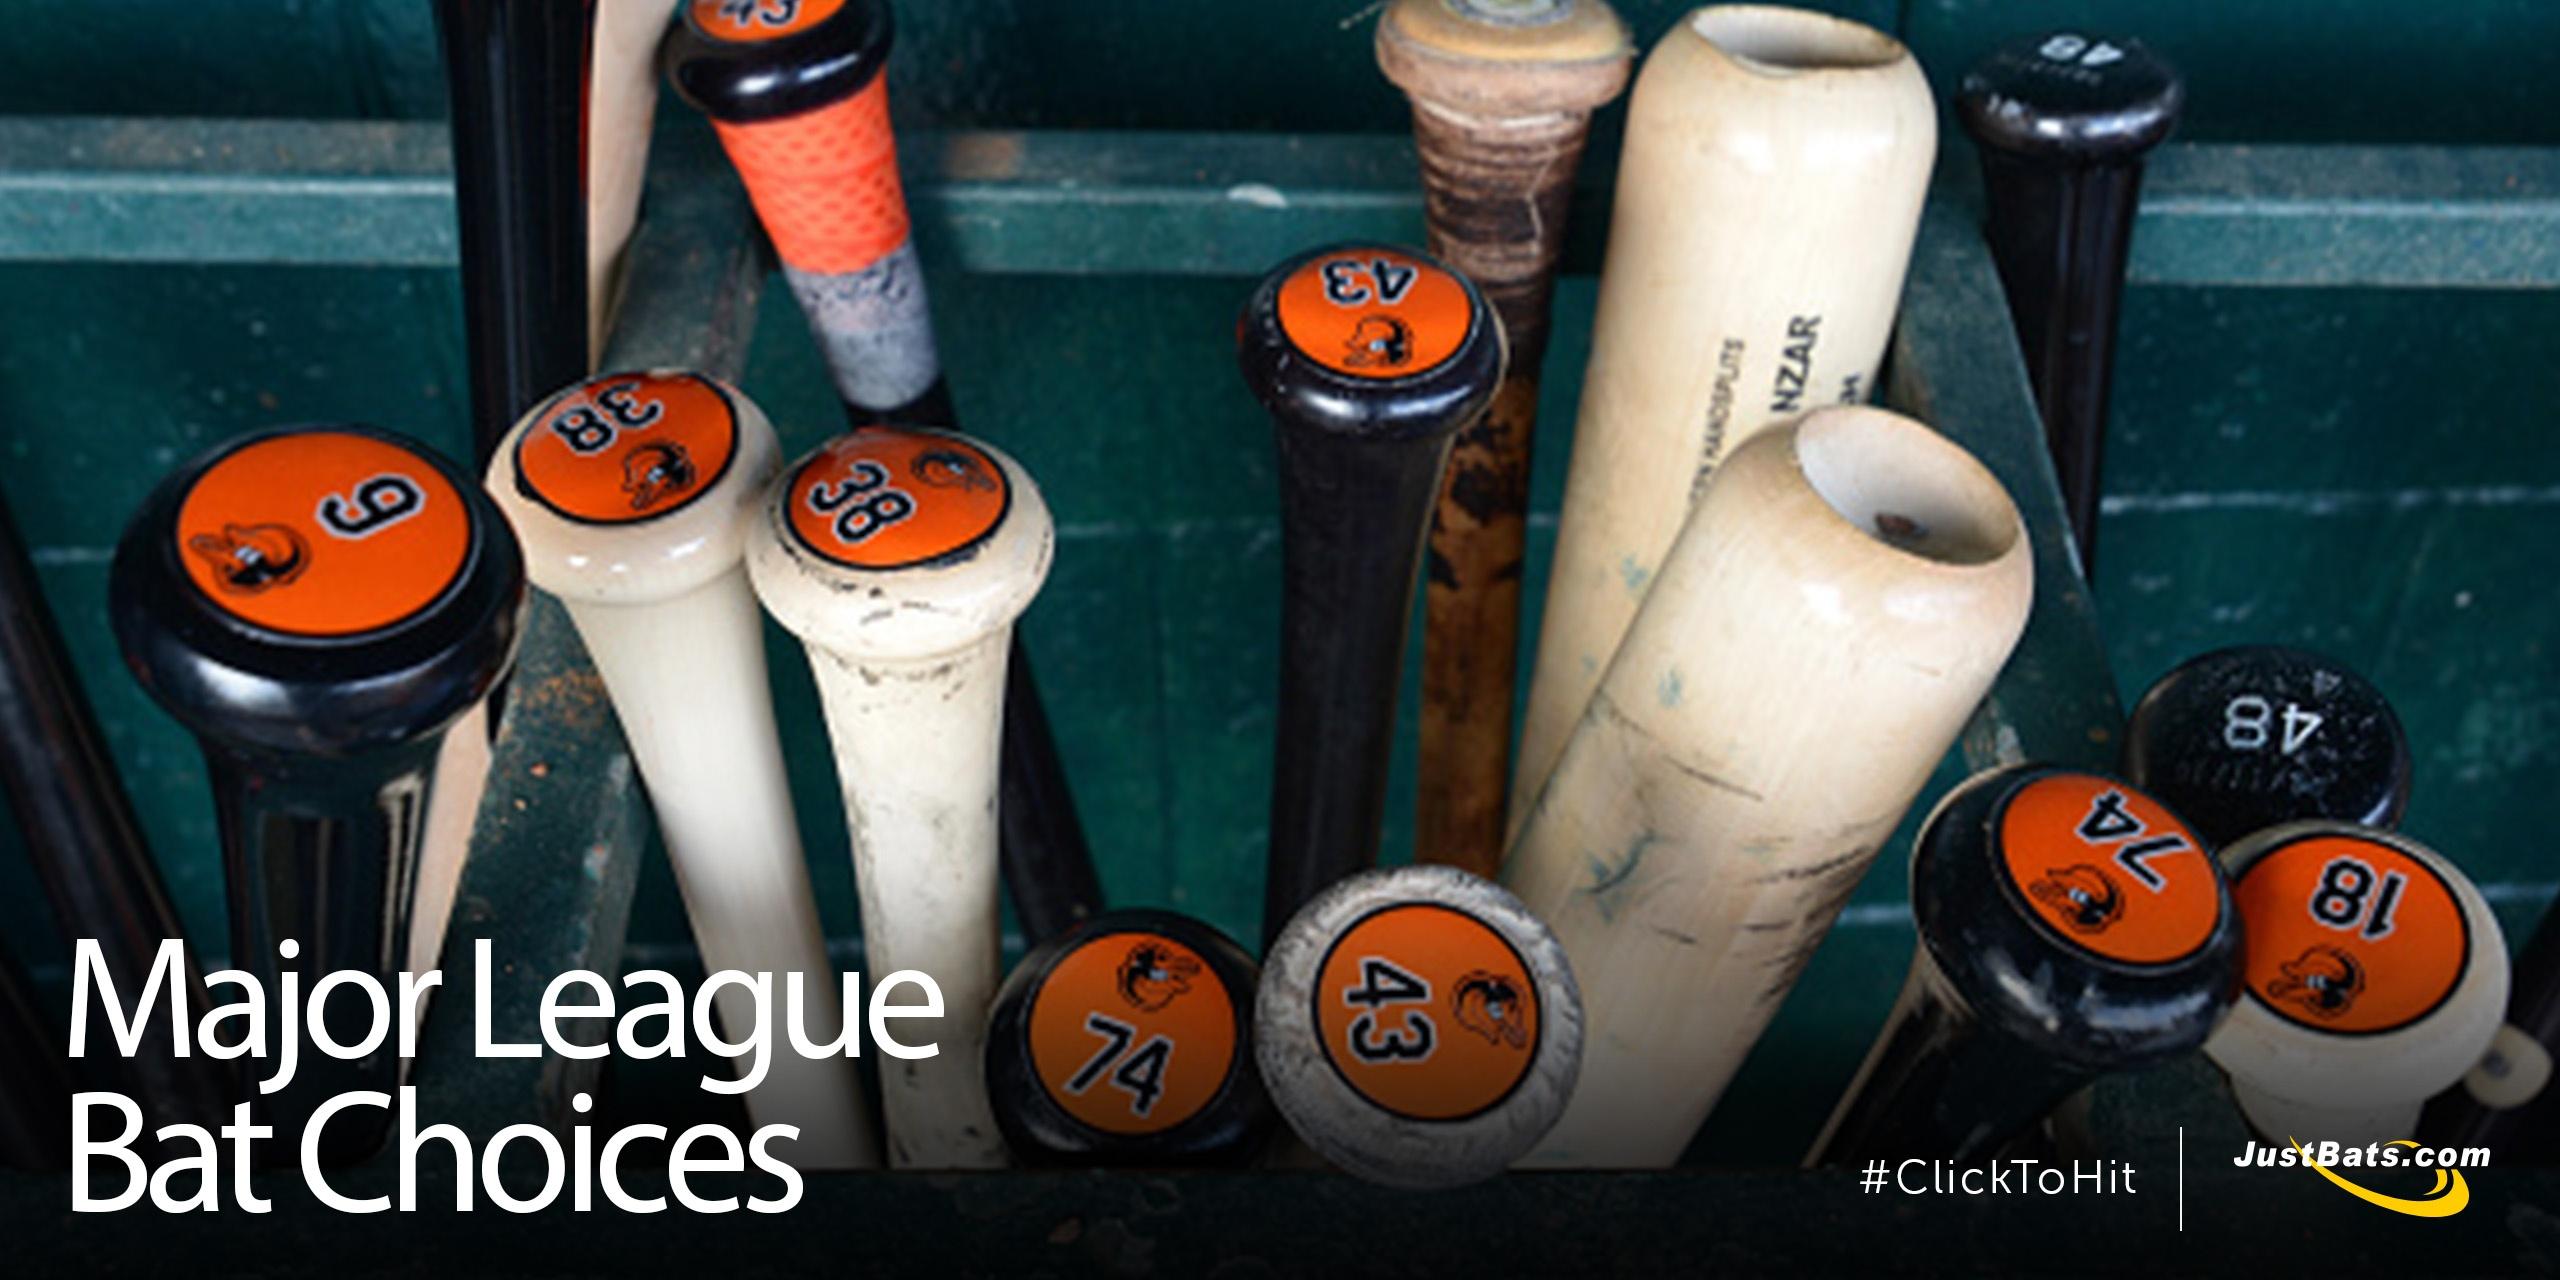 Major League Bat Choices - Blog.jpg